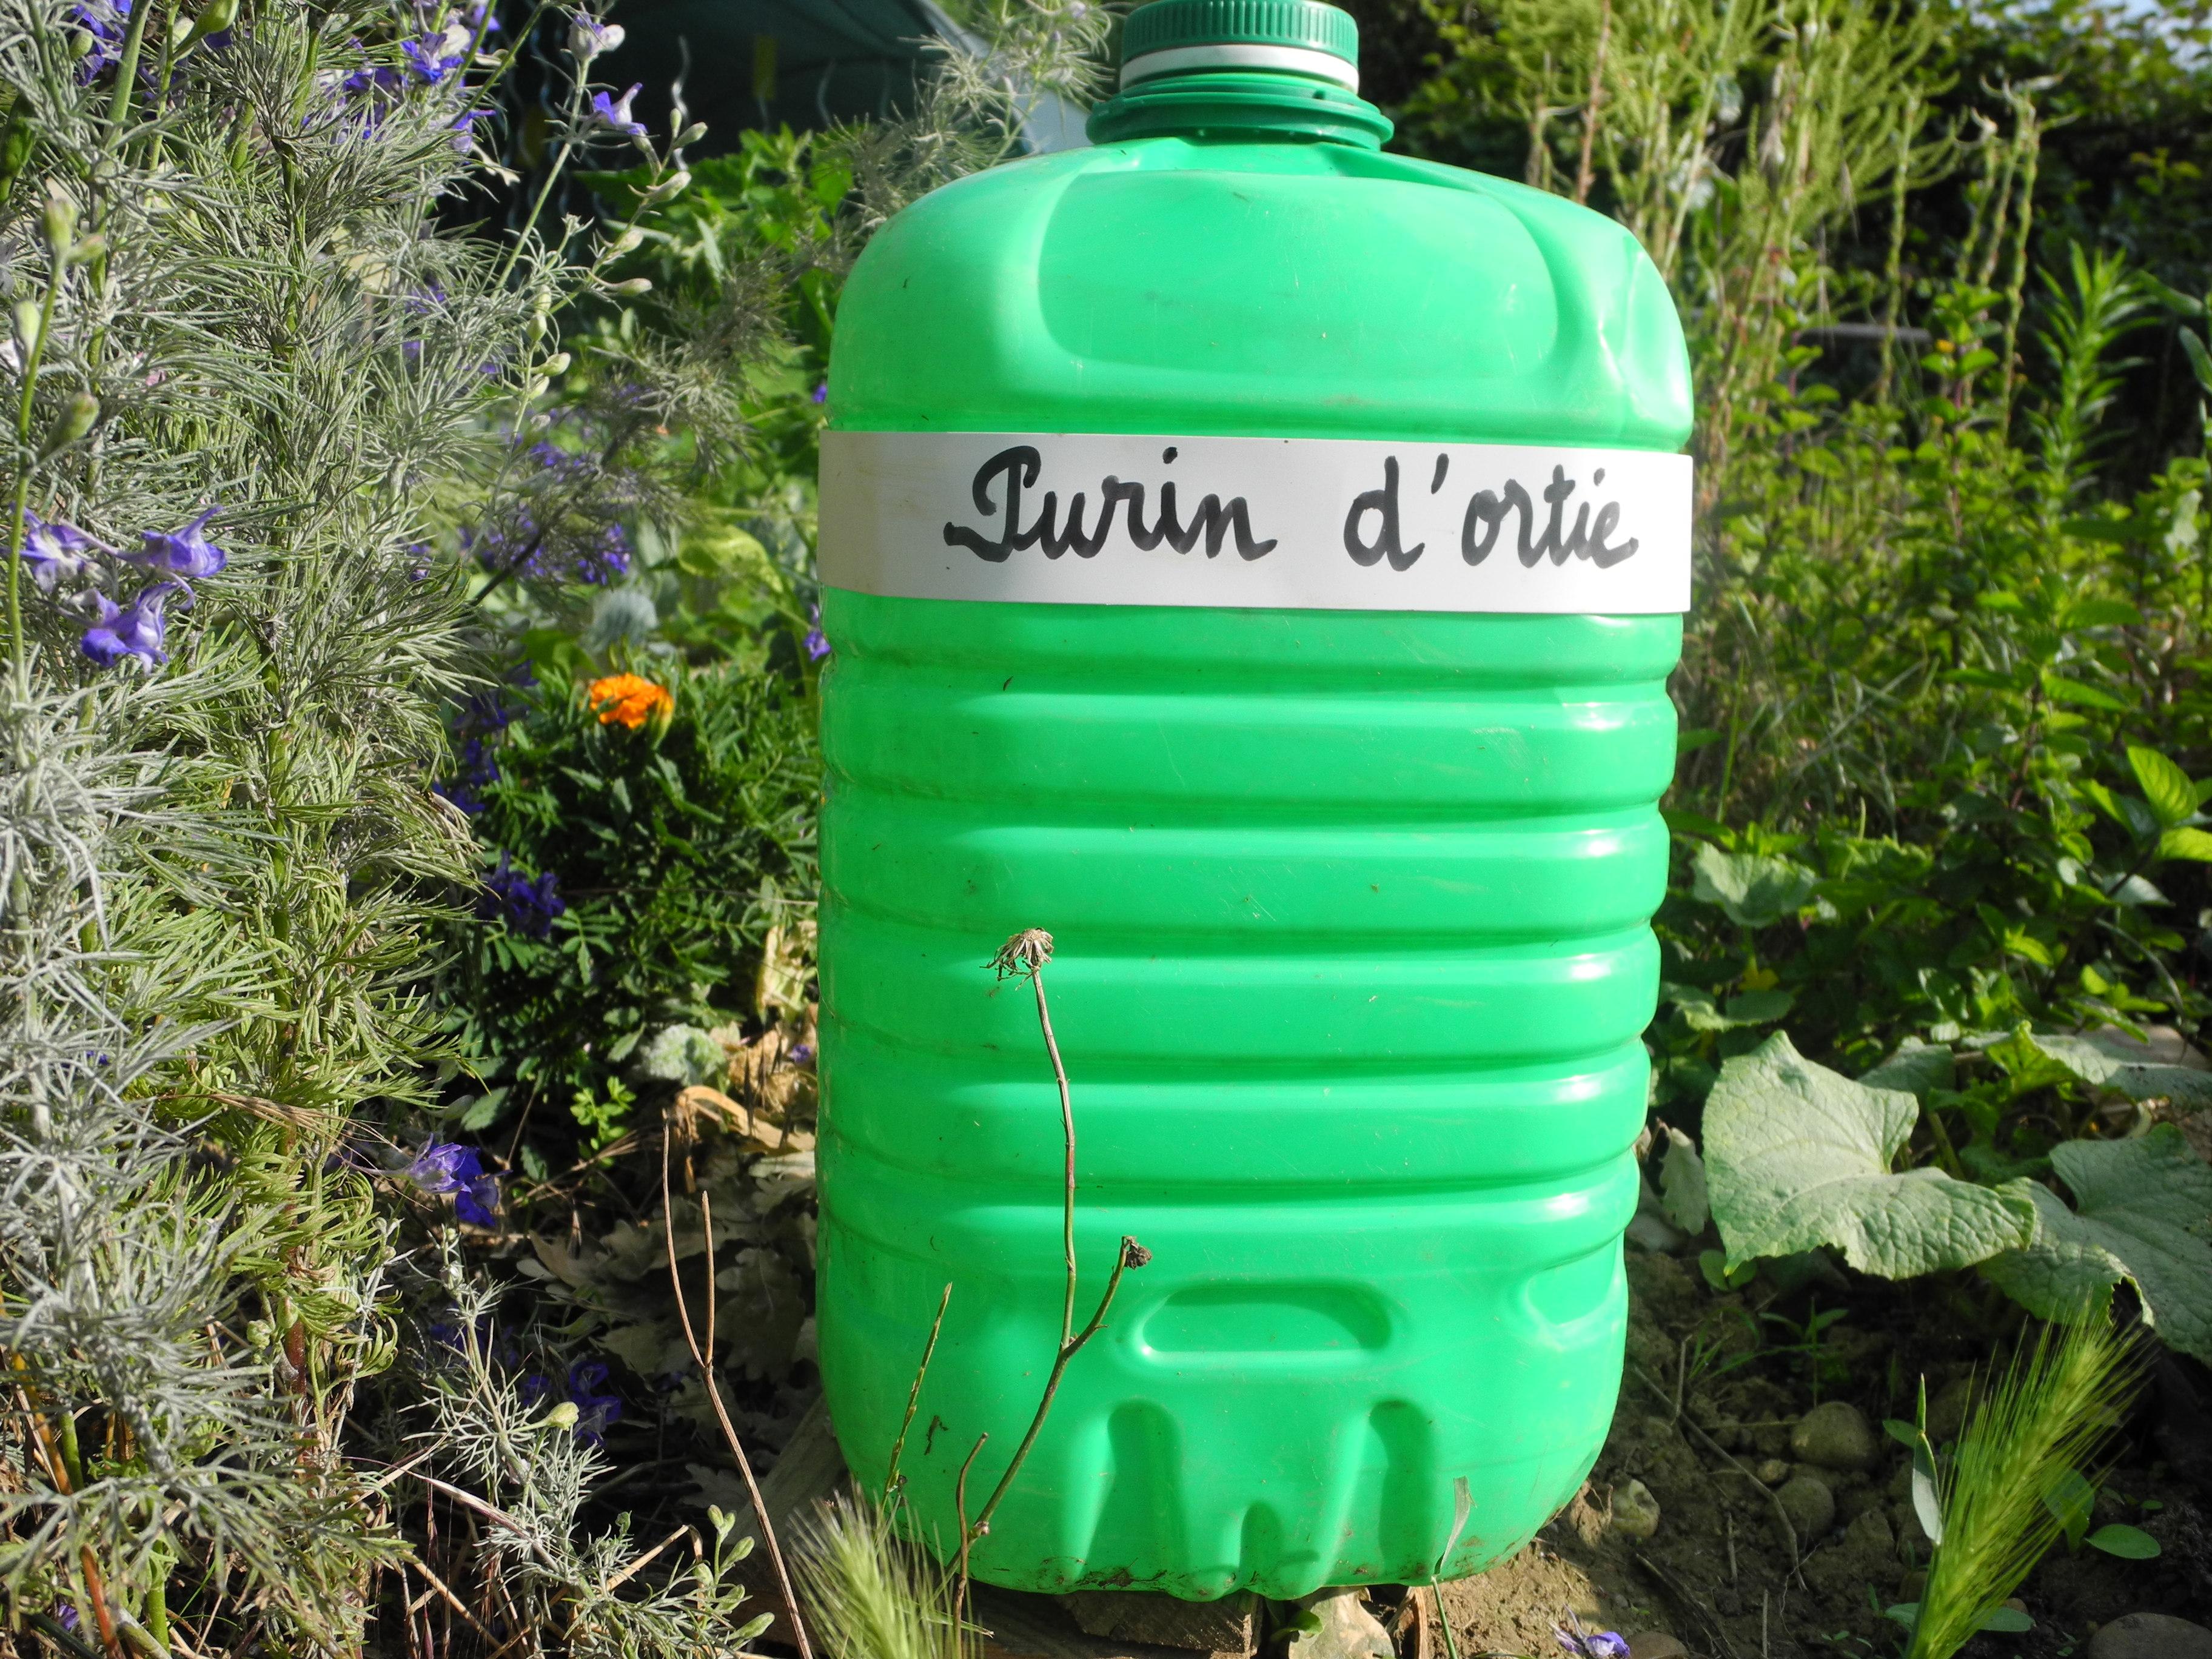 Travaux de printemps au jardin jardiner avec jean paul - Purin d ortie conservation ...